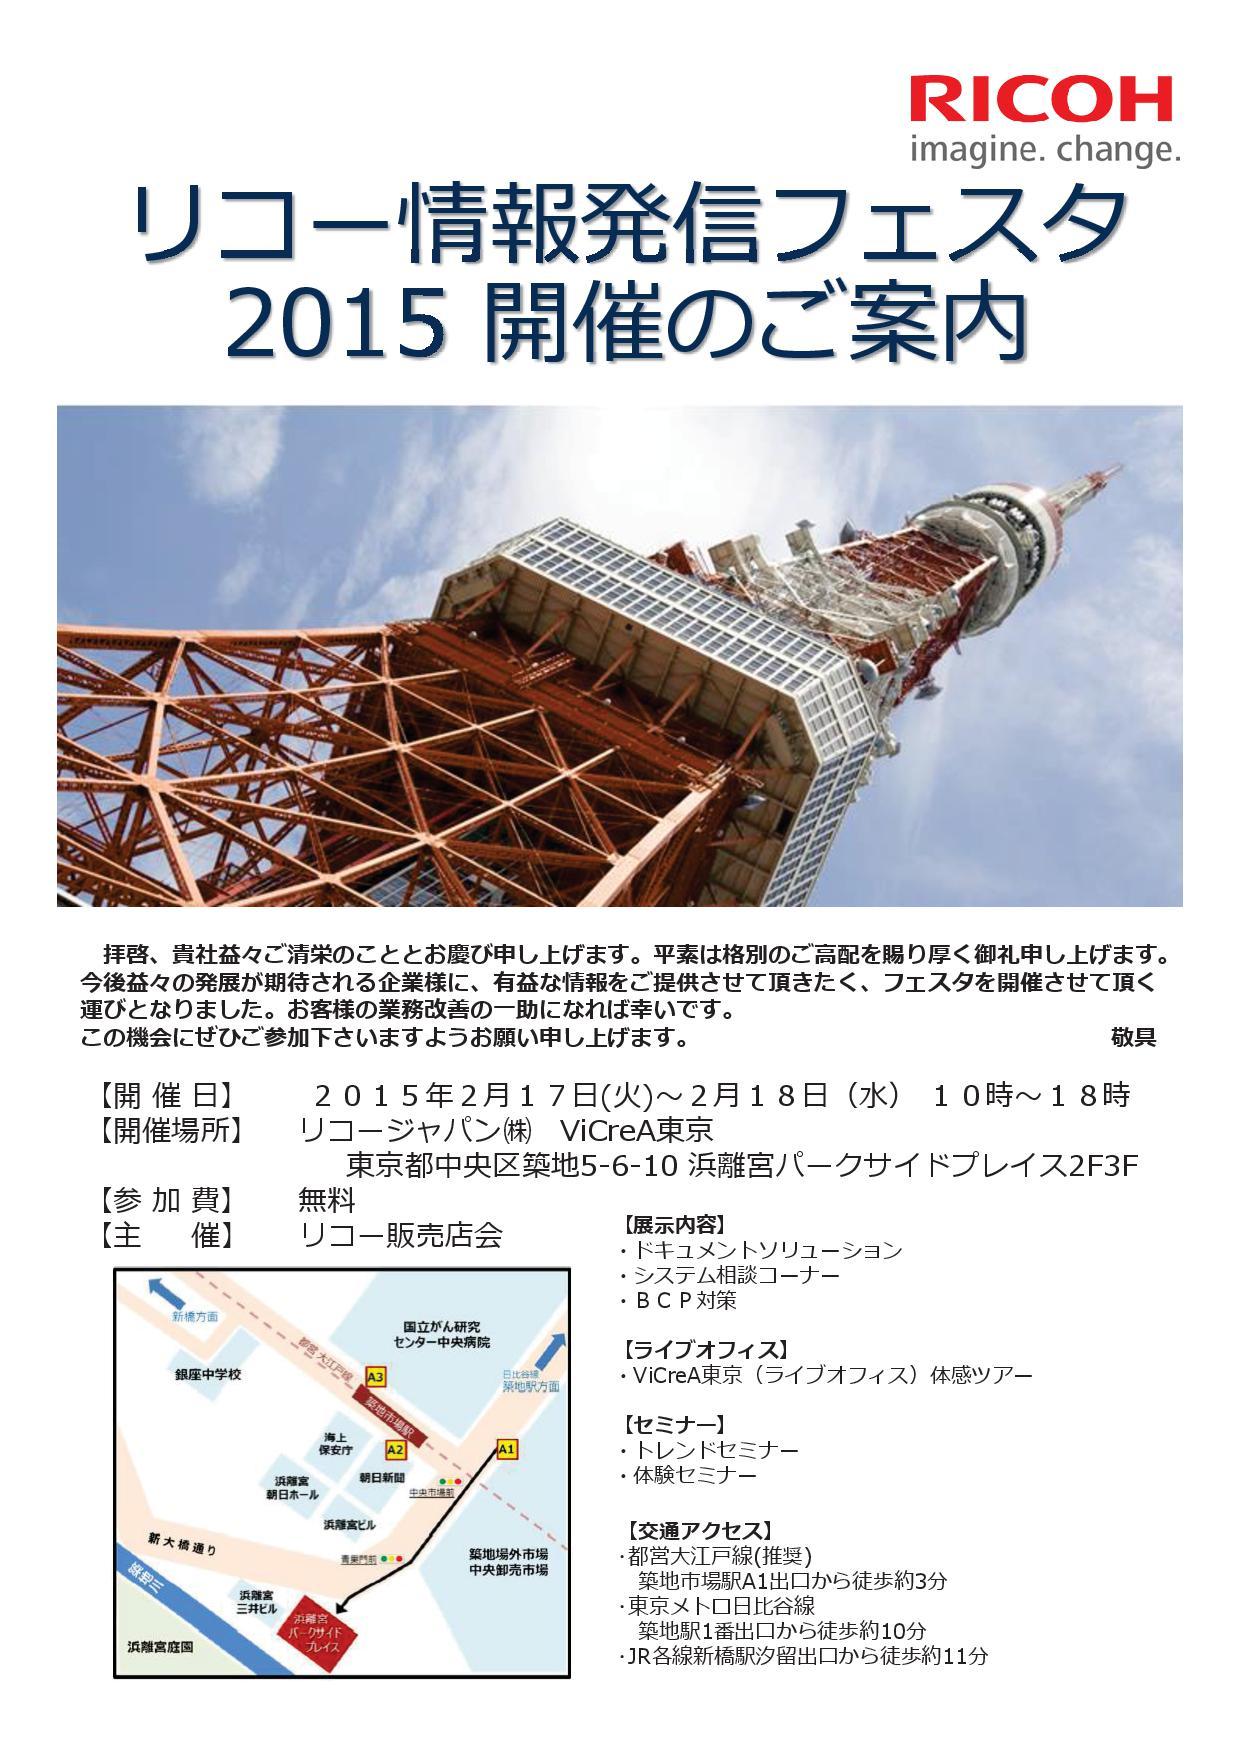 event_RICOH_jouhou_festa2015_20141229